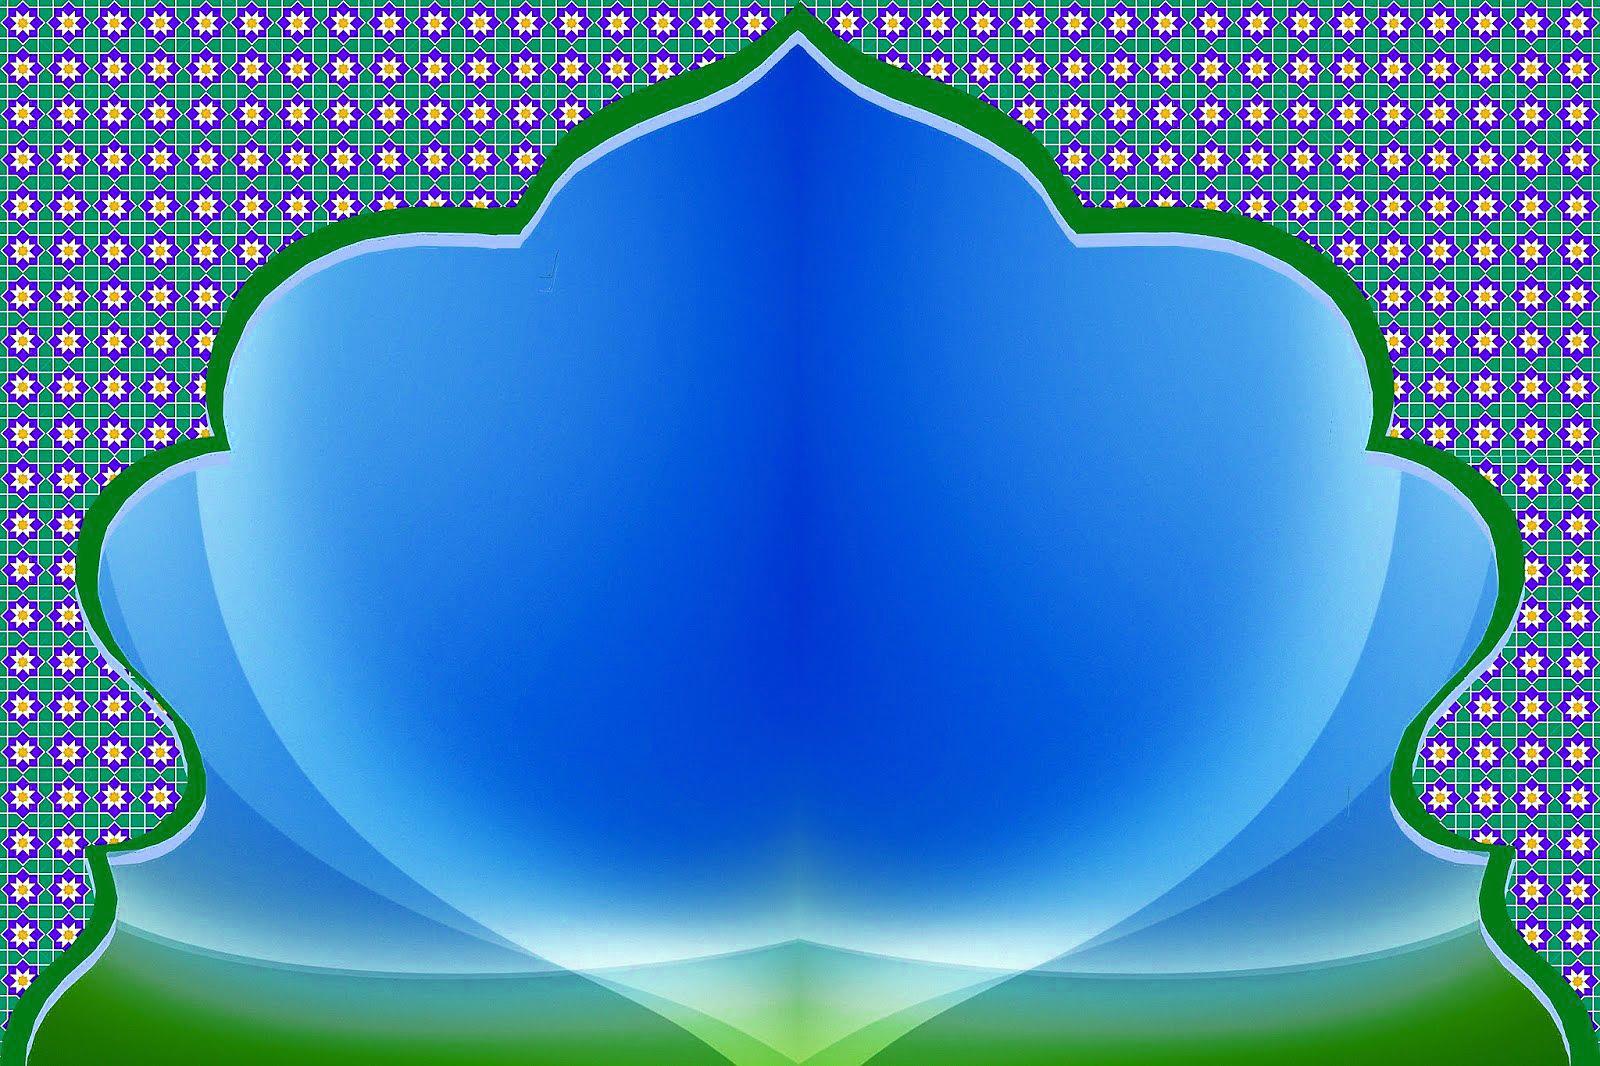 Gambar Background Islami Oman Air Hd Wallpapers Images